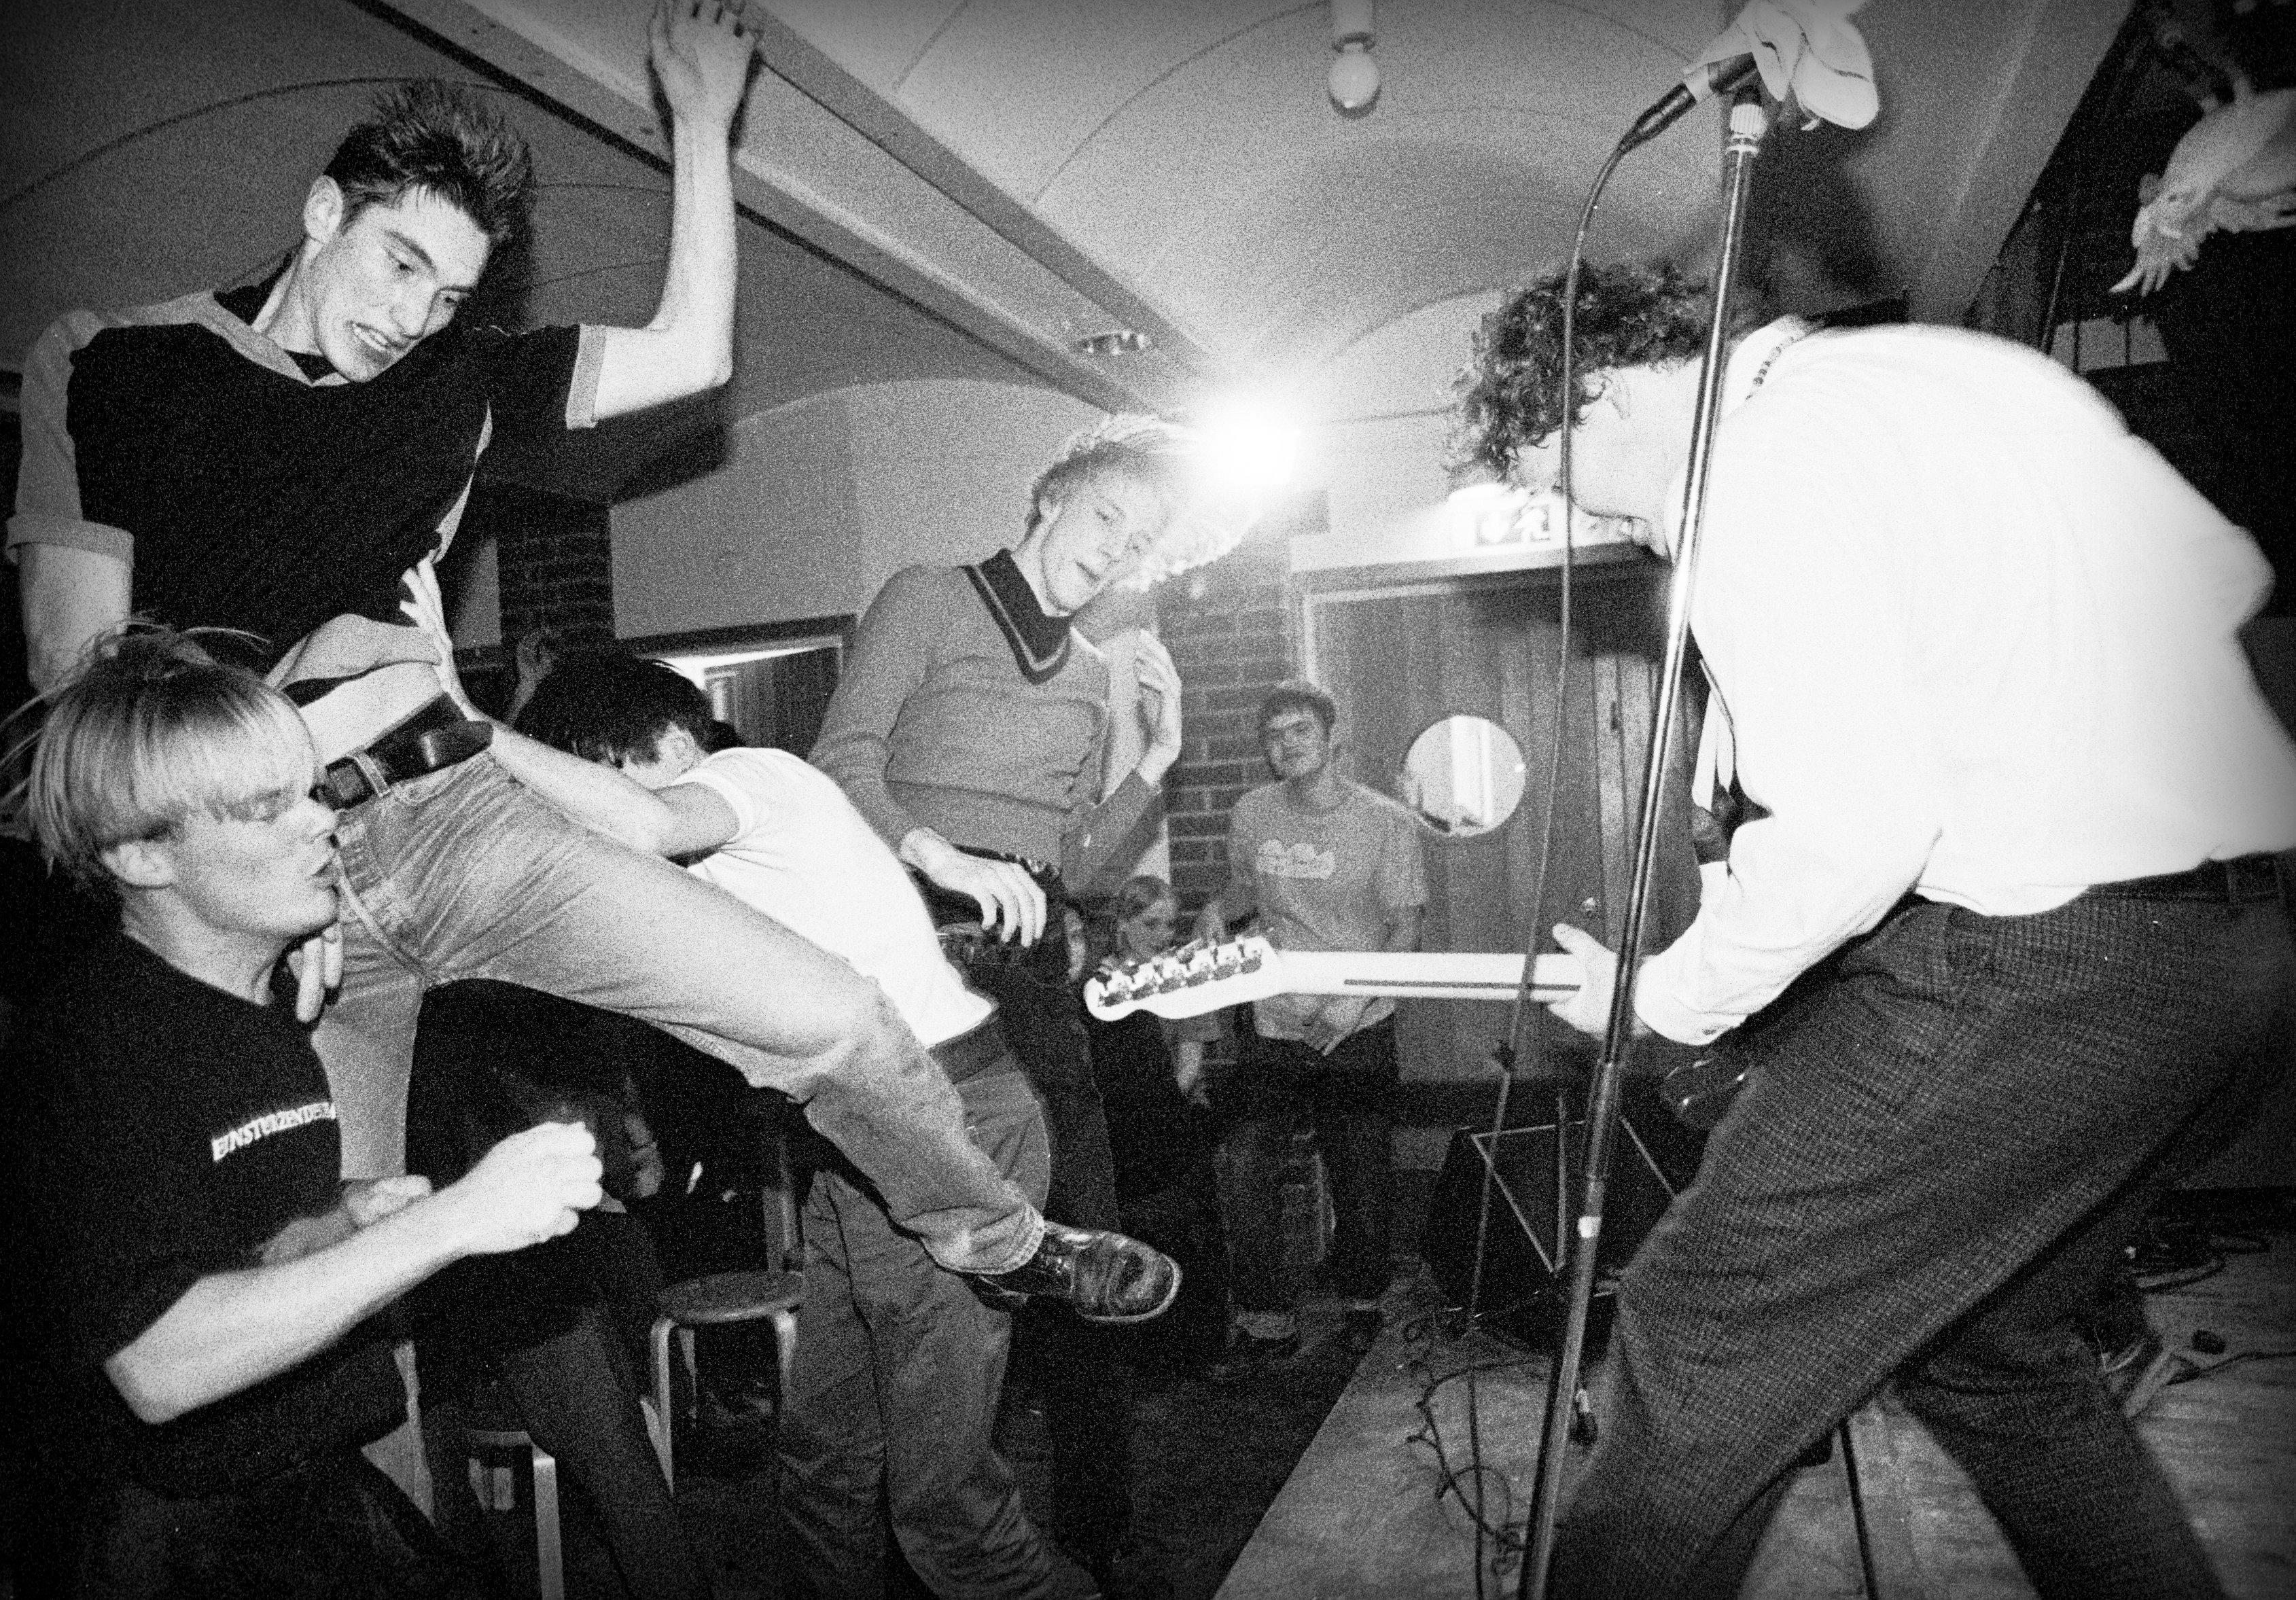 Concert in the basement